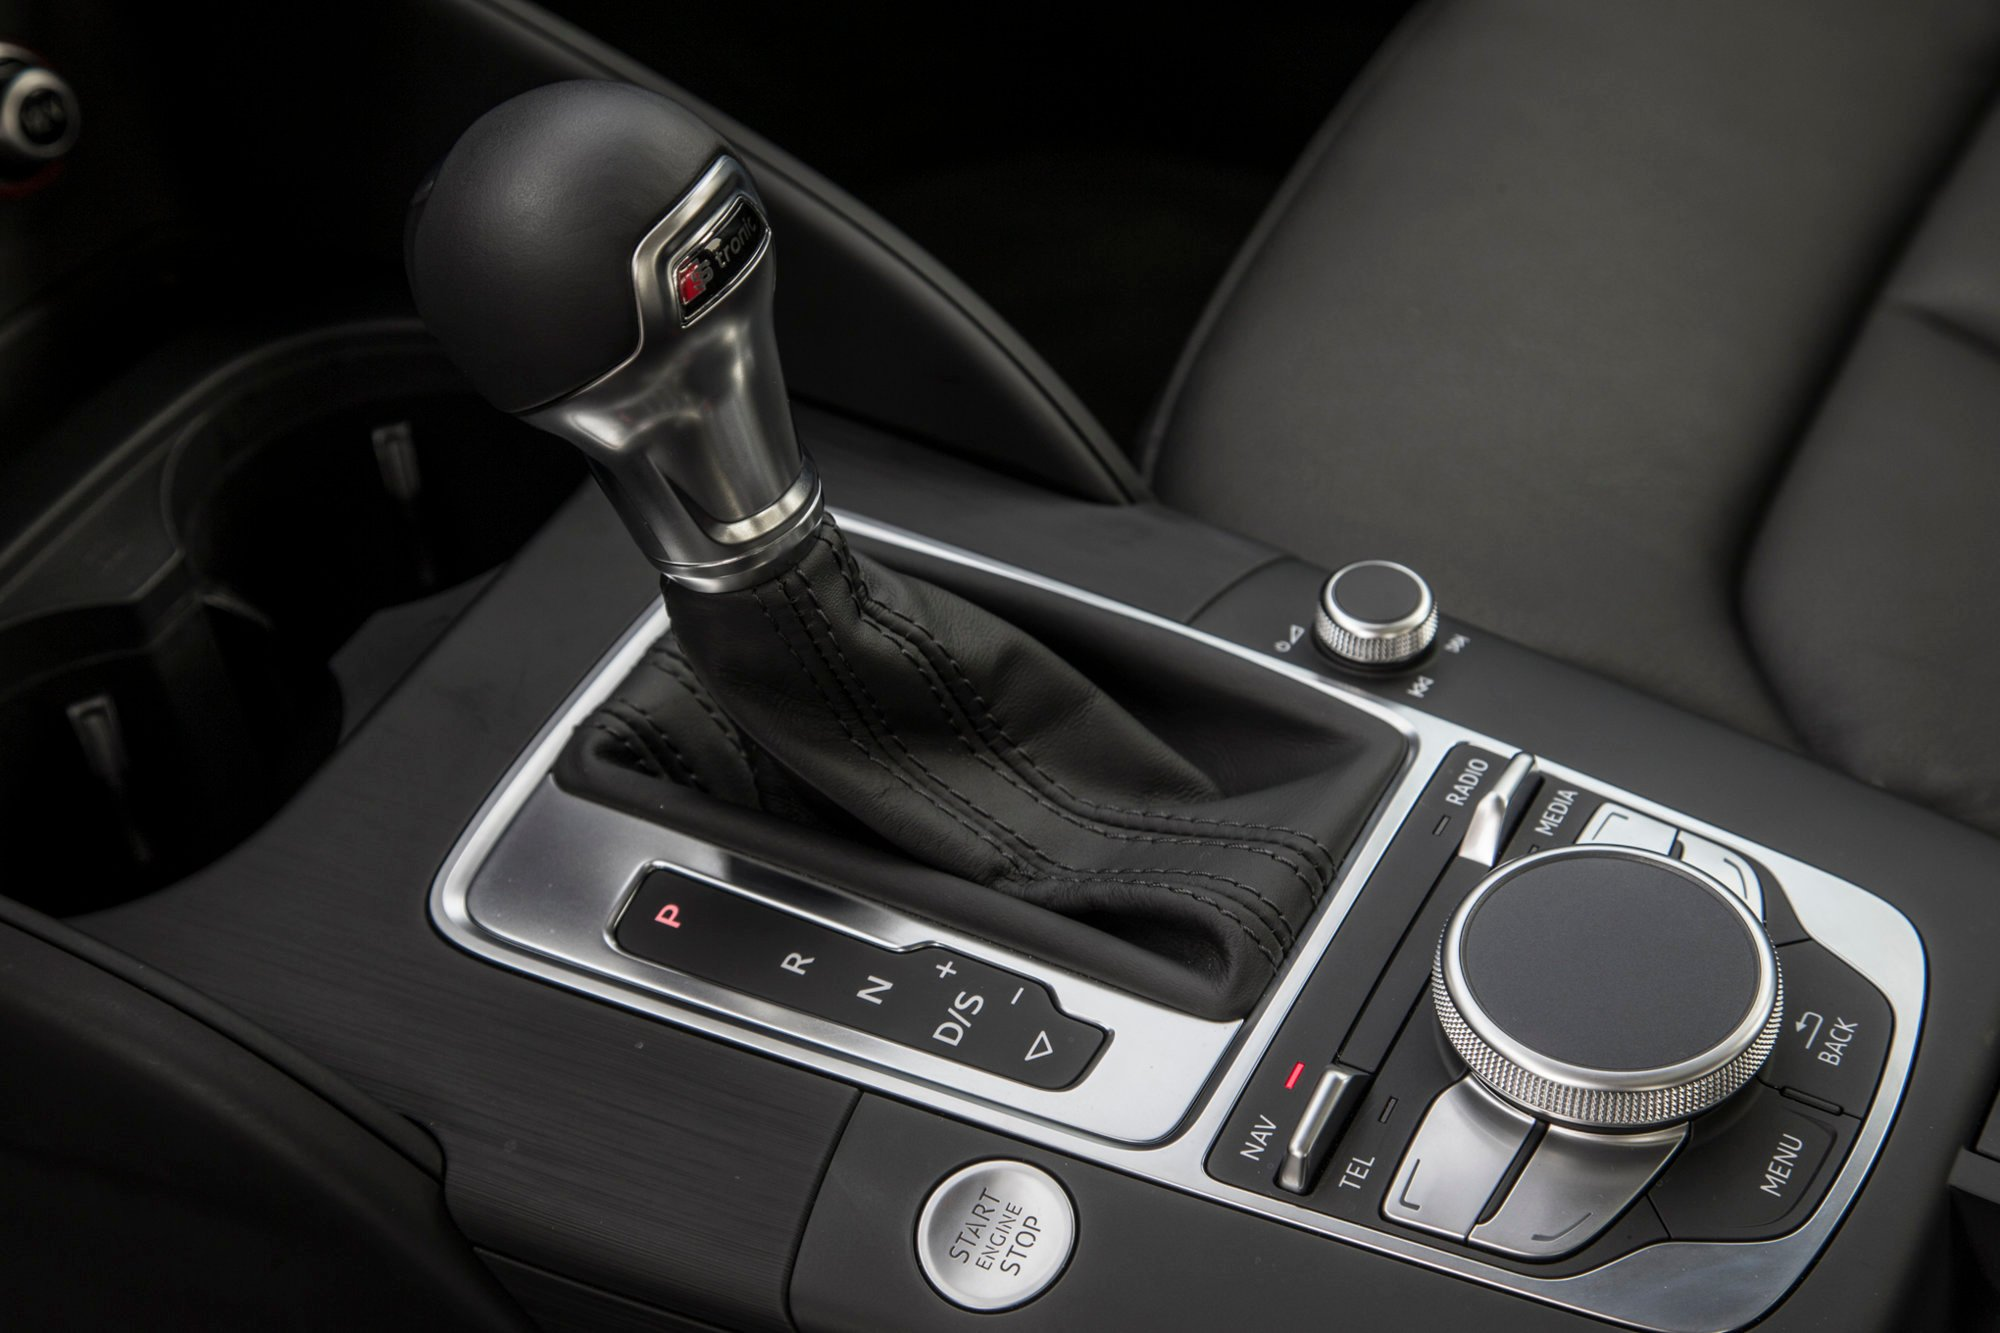 2015-Audi-A3-18T-center-console-gear-knob.jpg